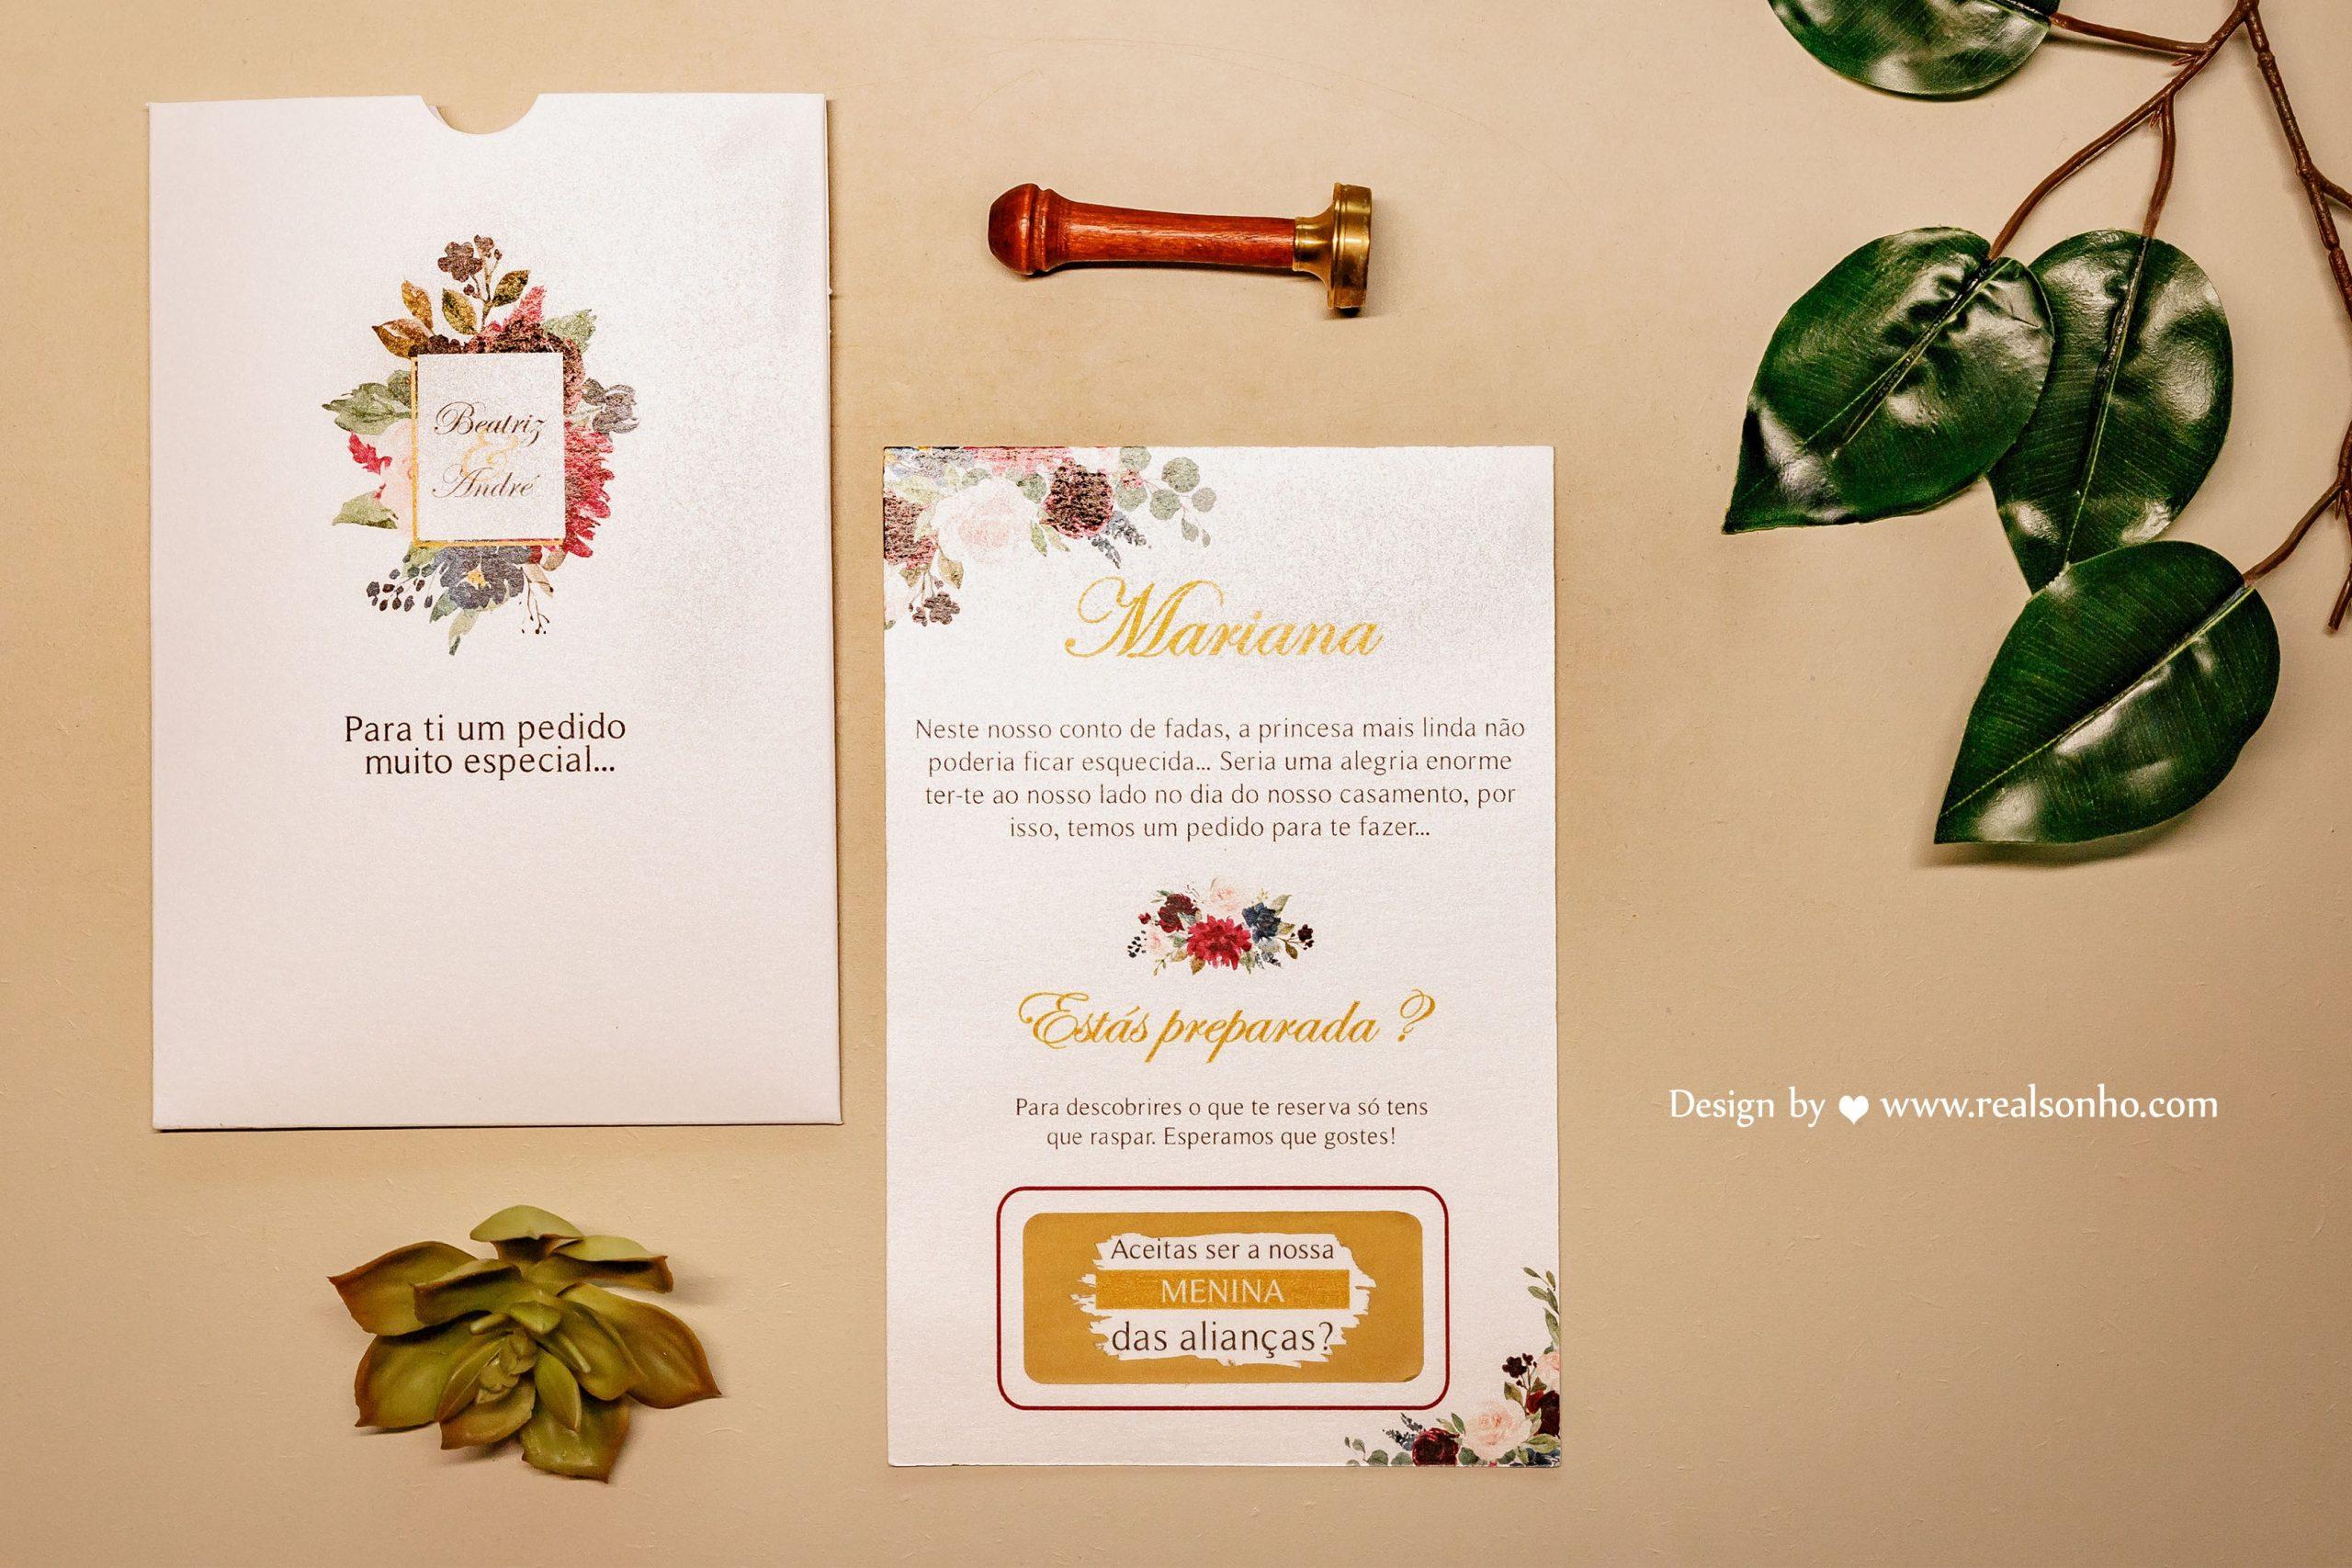 Convite Raspadinha Burgundy (Menino/Menina das Alianças)